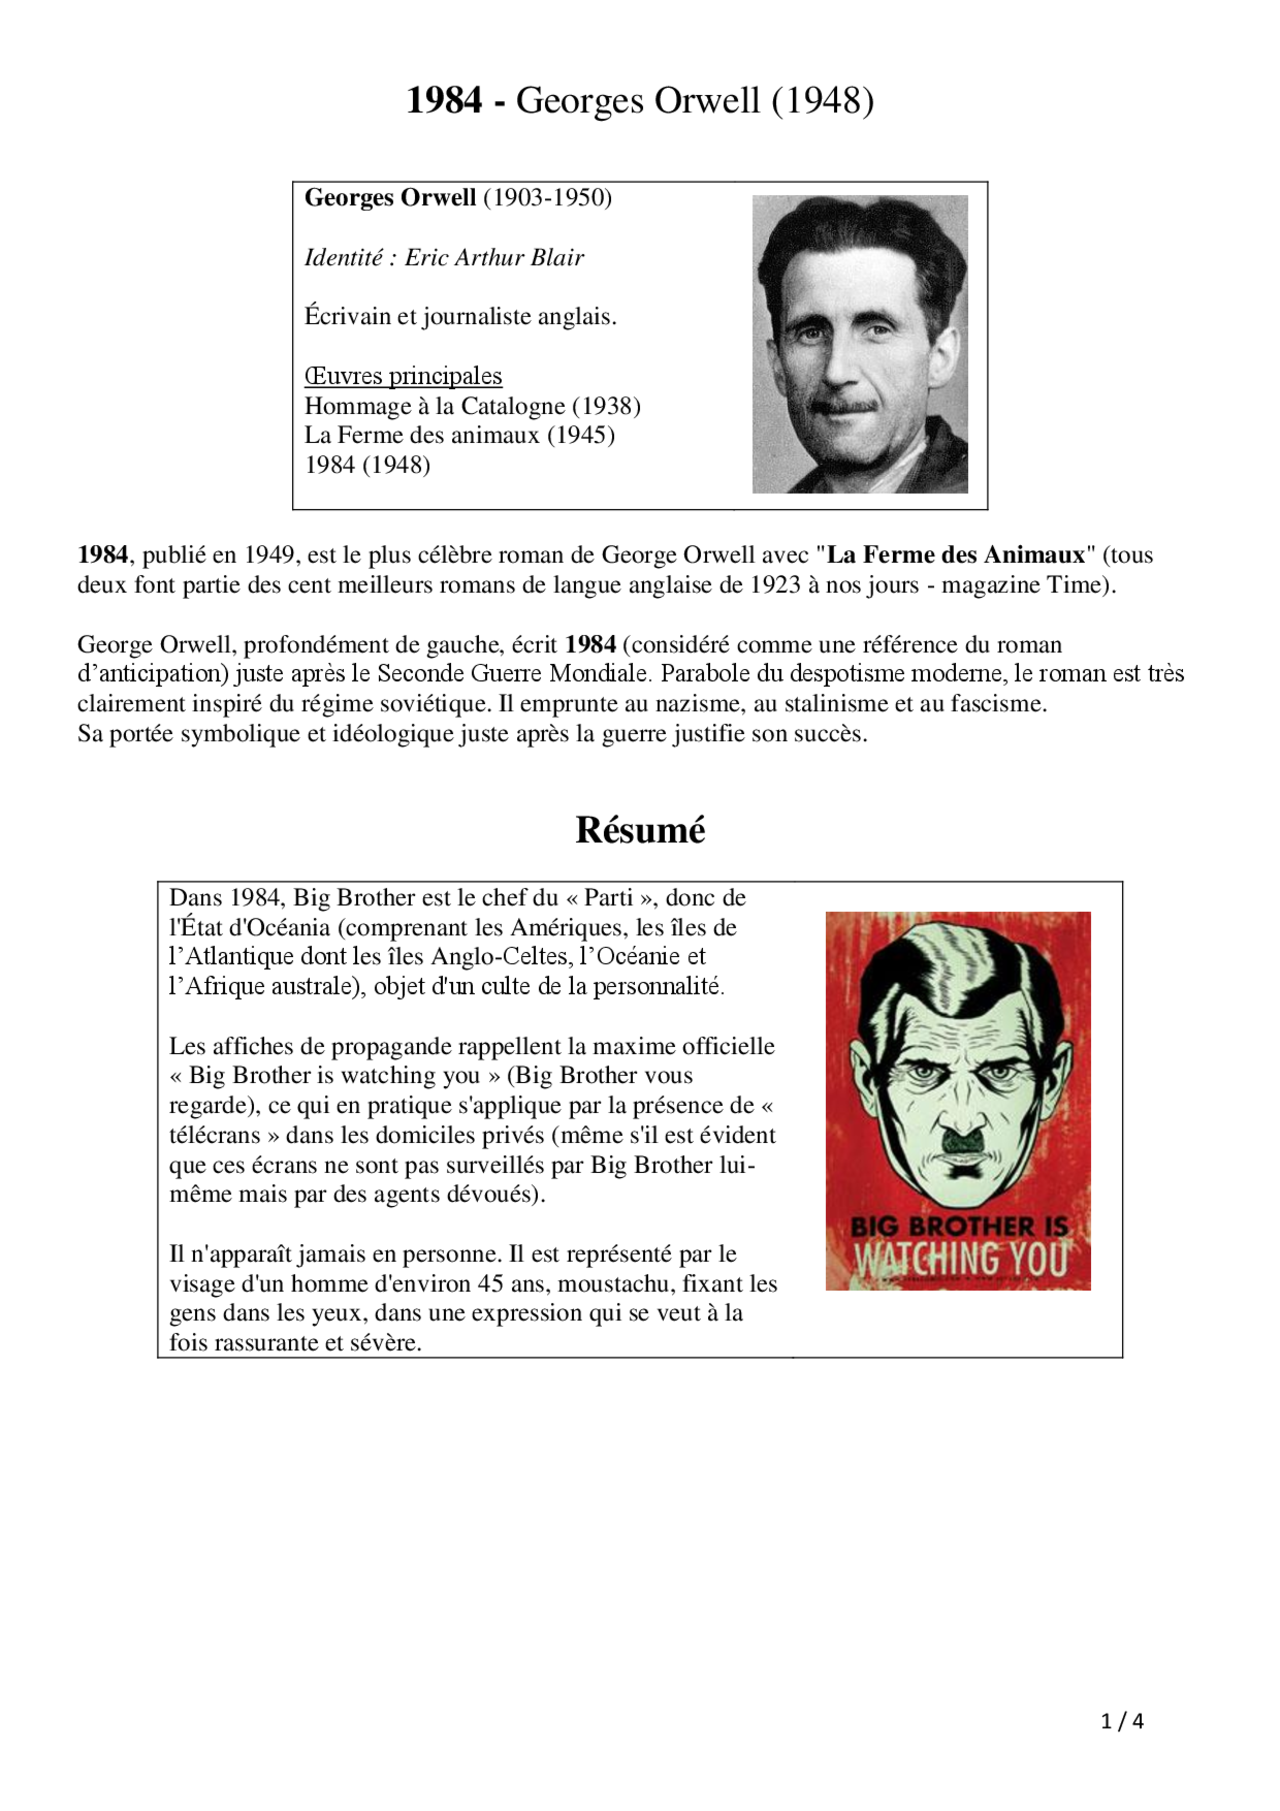 1984 Georges Orwell 1948 Resume Court Docsity